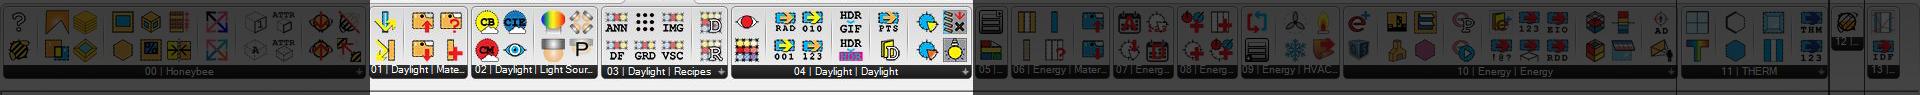 s03_09_interface_daylight